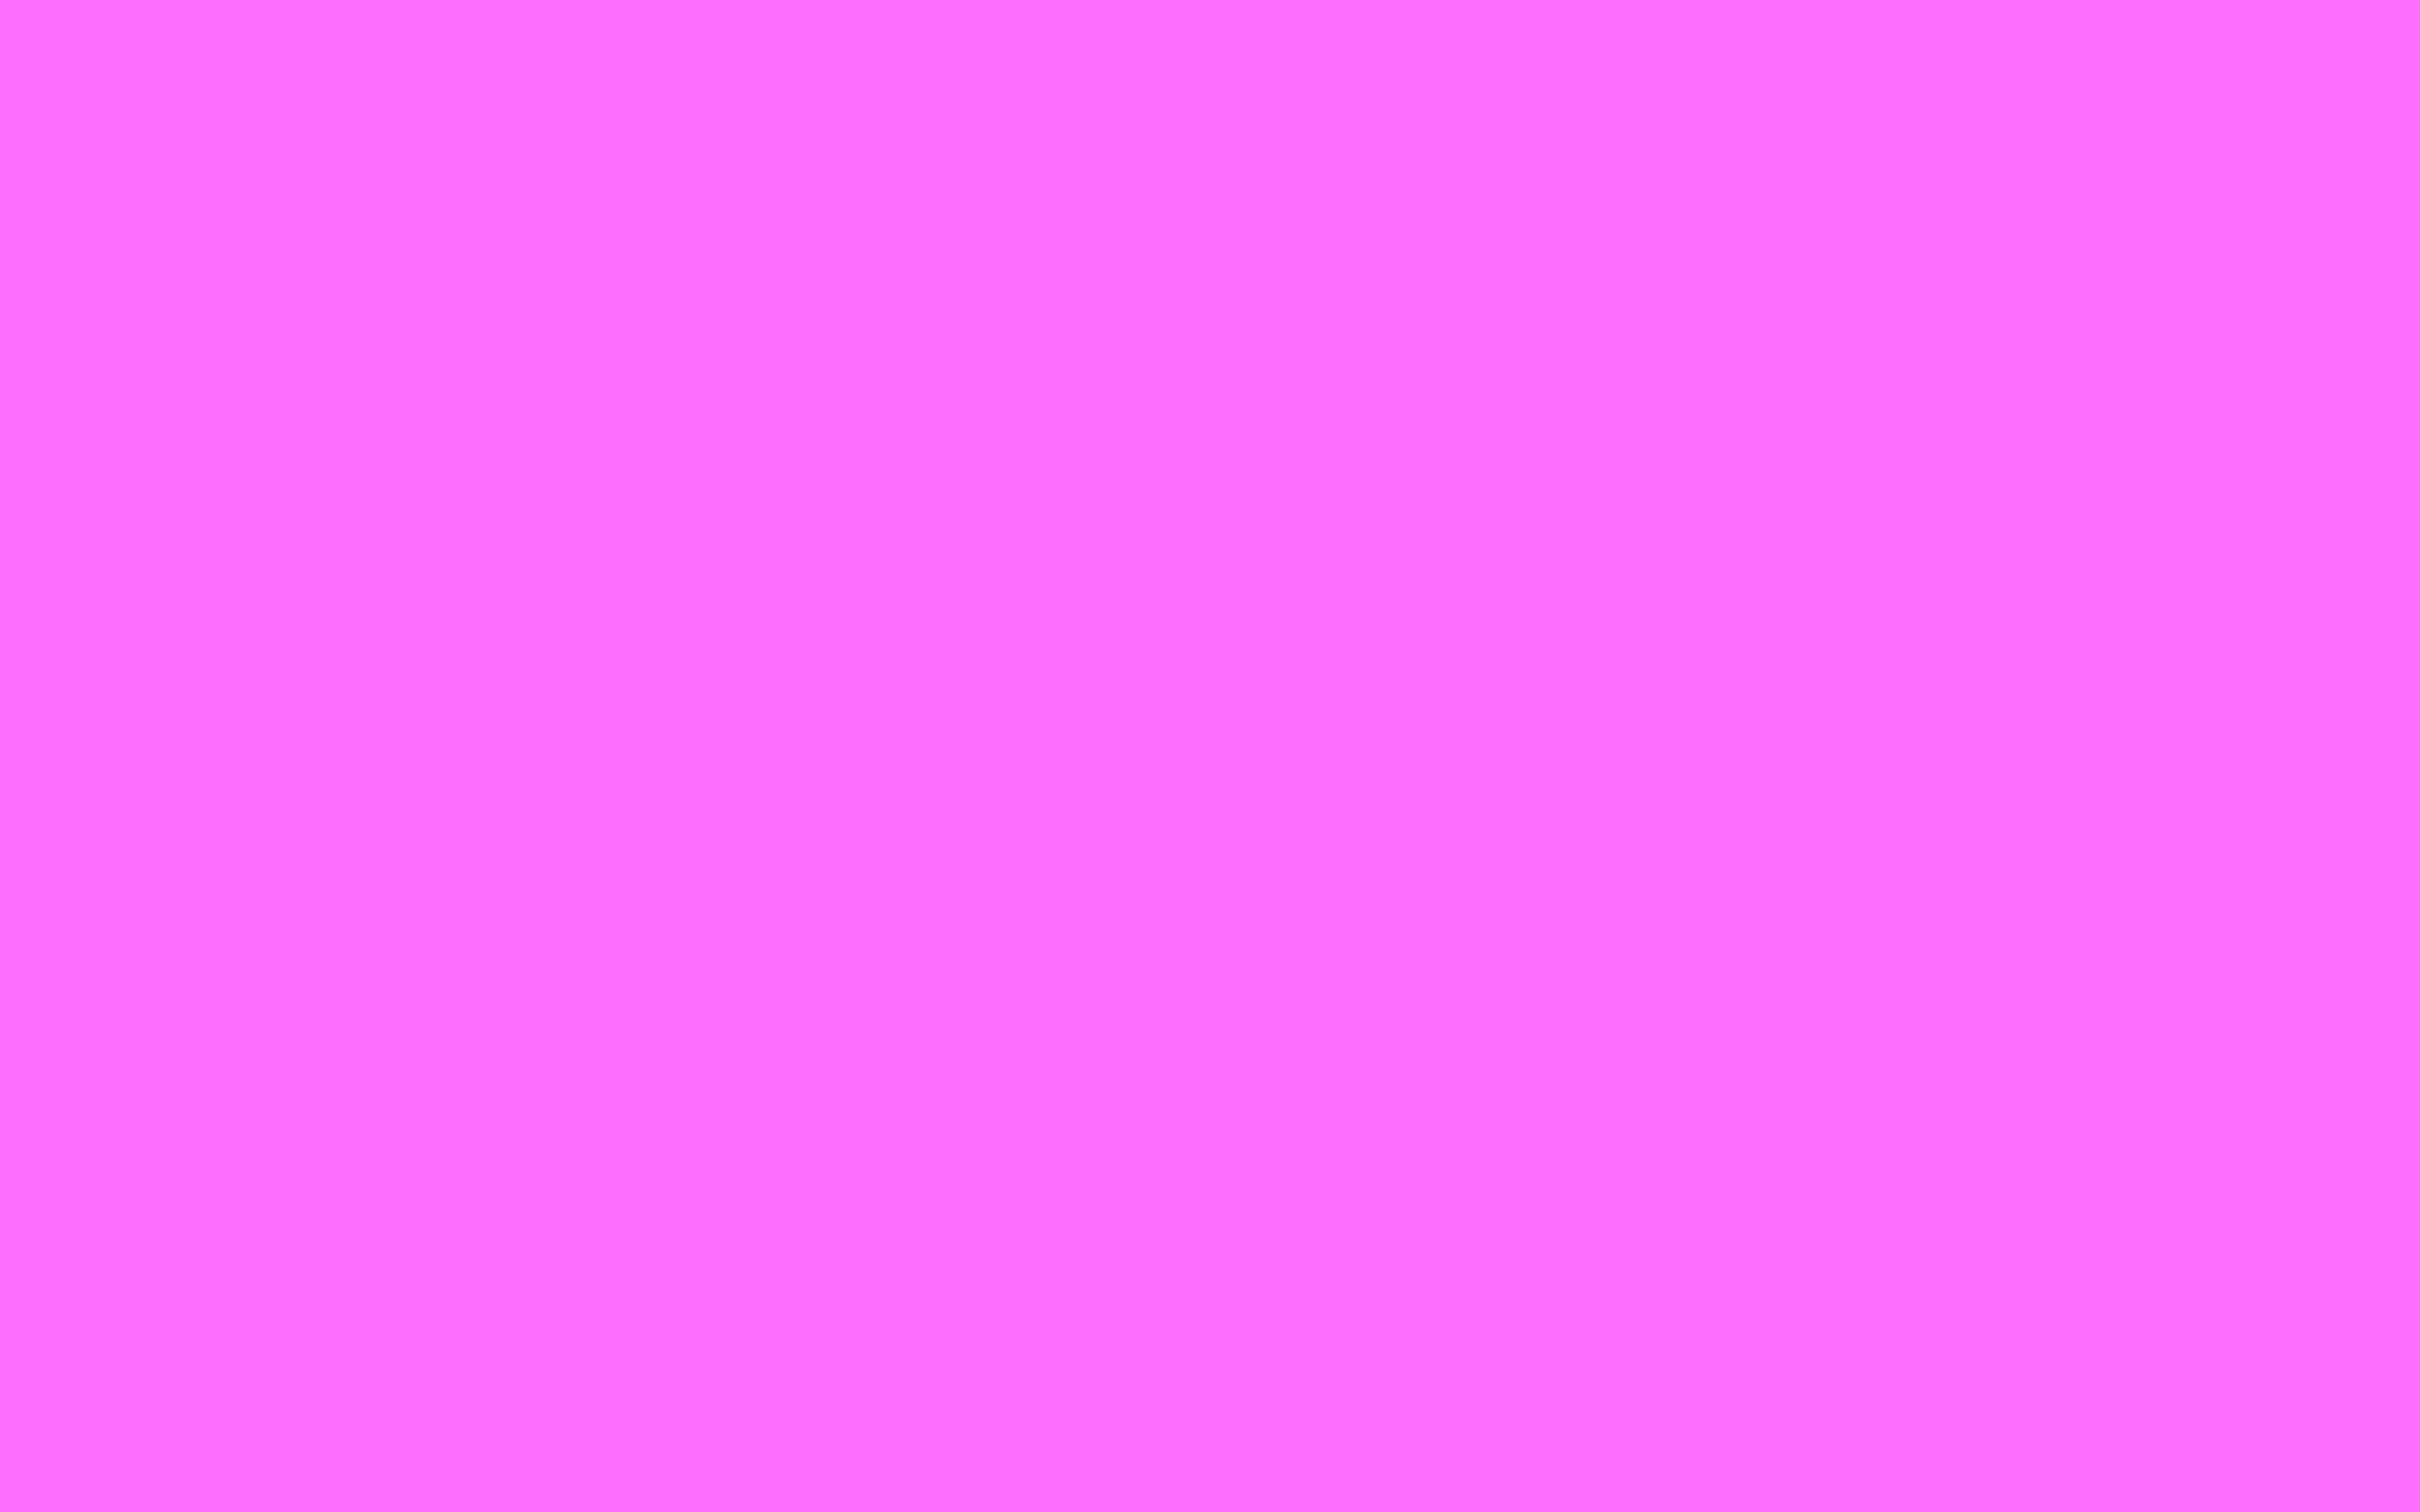 2560x1600 Shocking Pink Crayola Solid Color Background